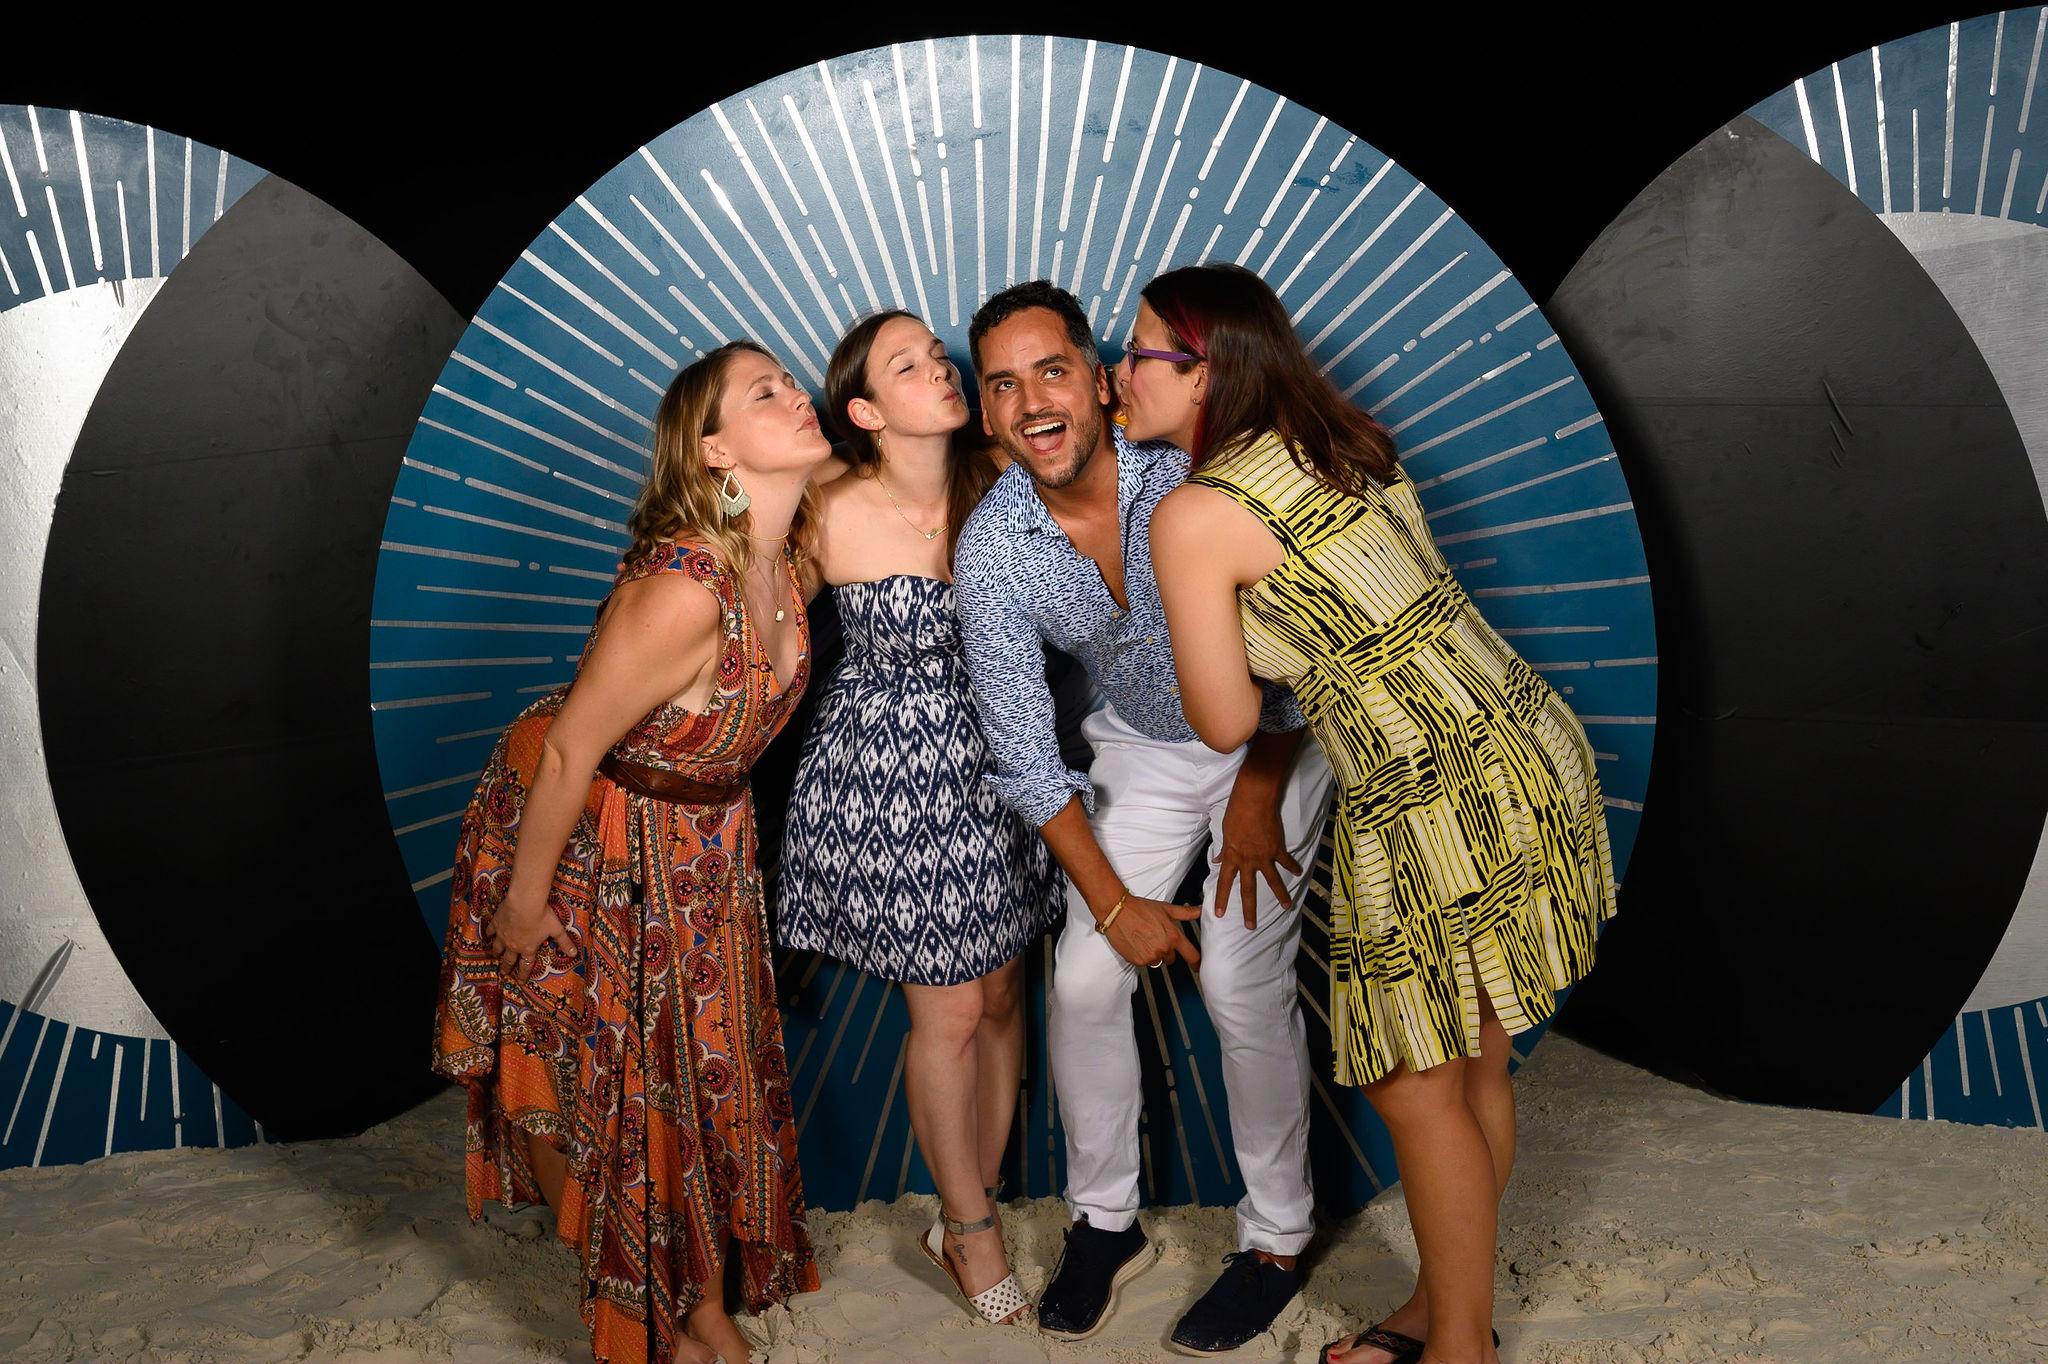 bangastudios 0250 - How to Make the Most of Engage Wedding Summits